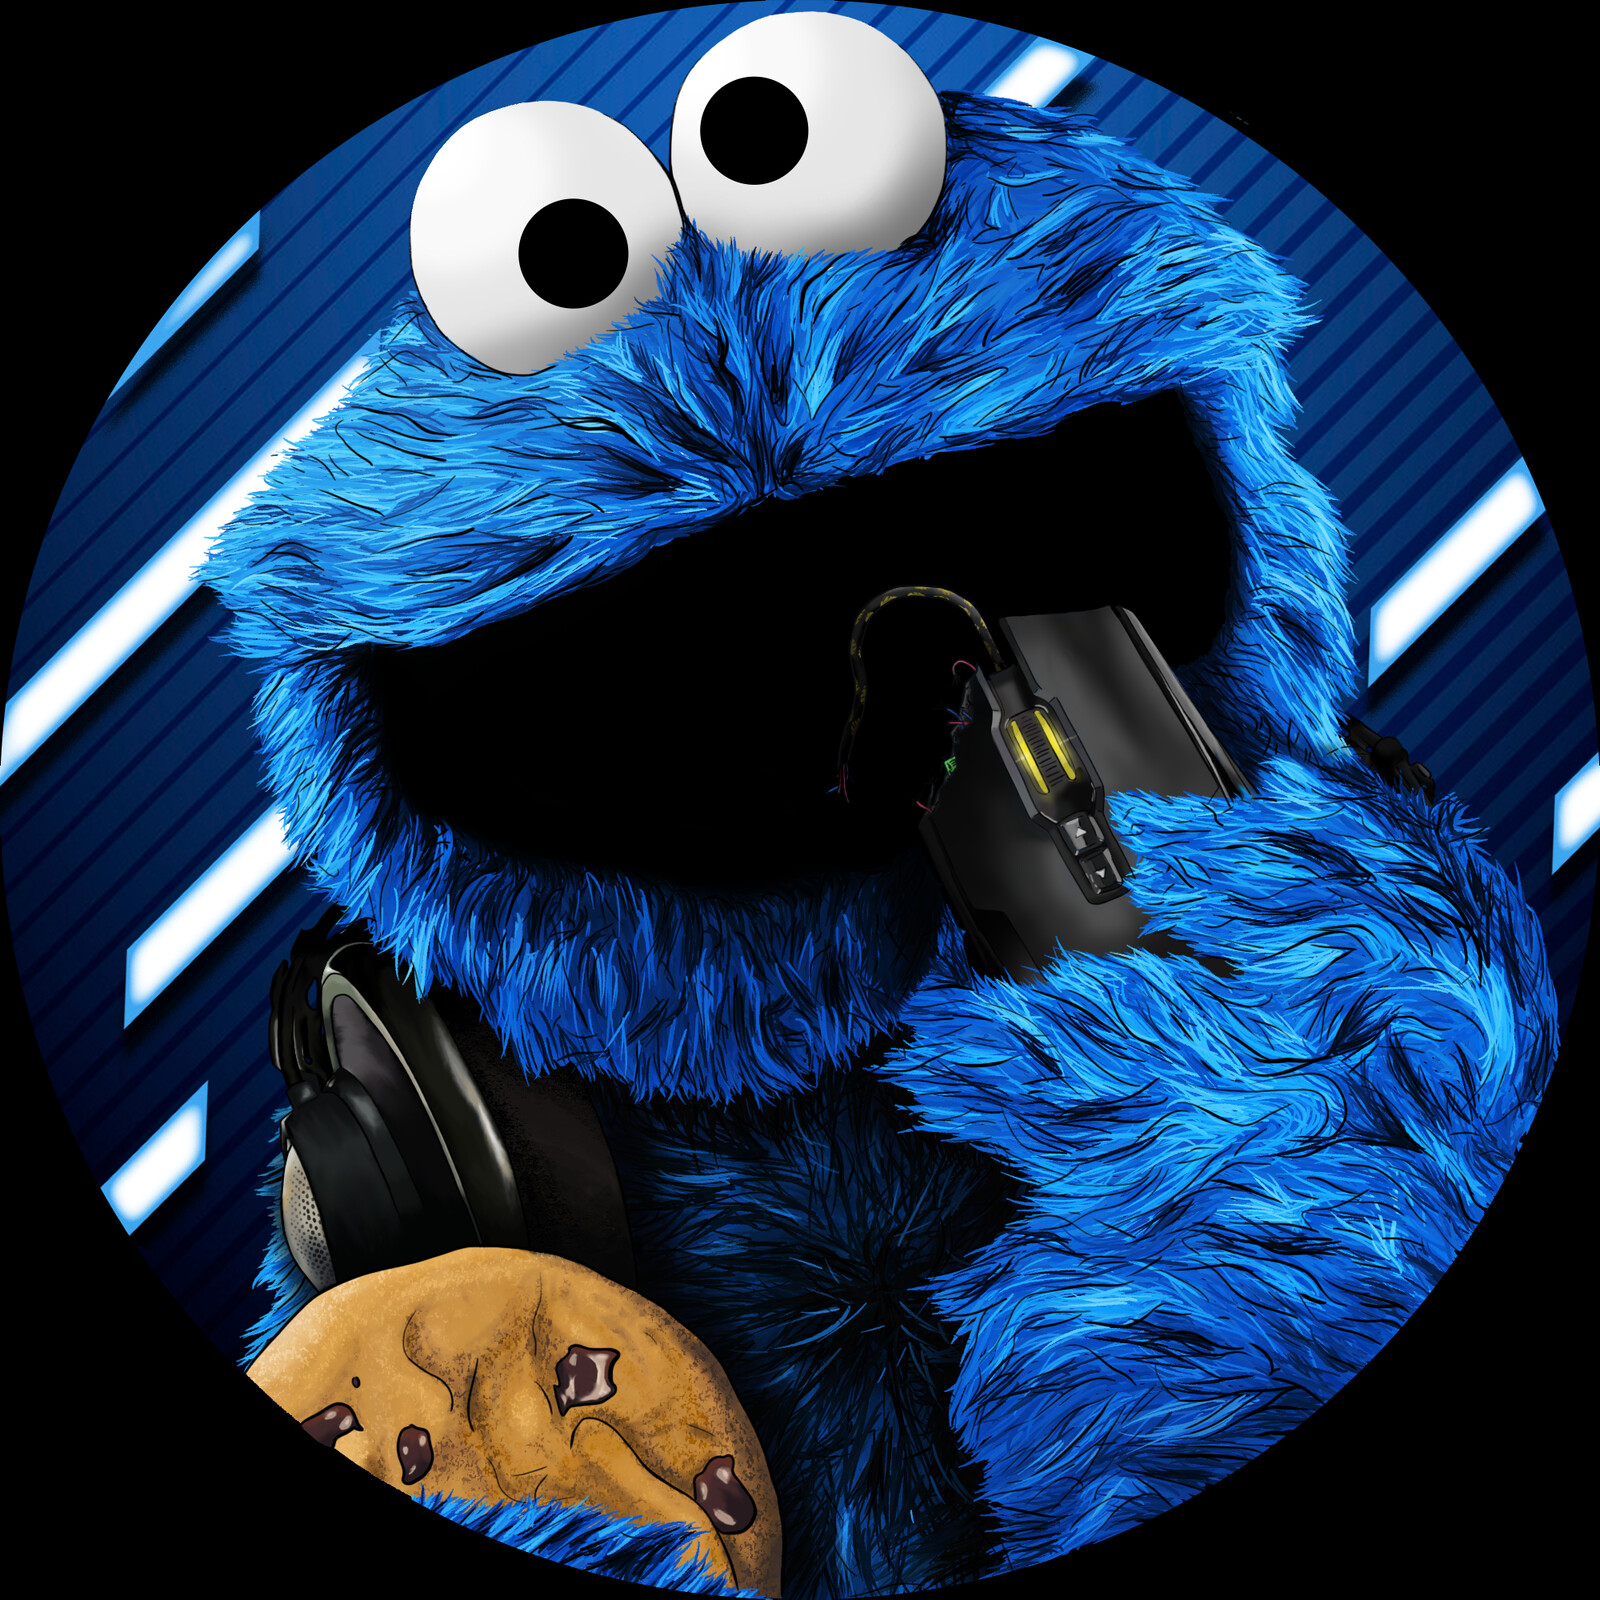 ArtStation - Cookie Monster Discord Profile , Alex Masko